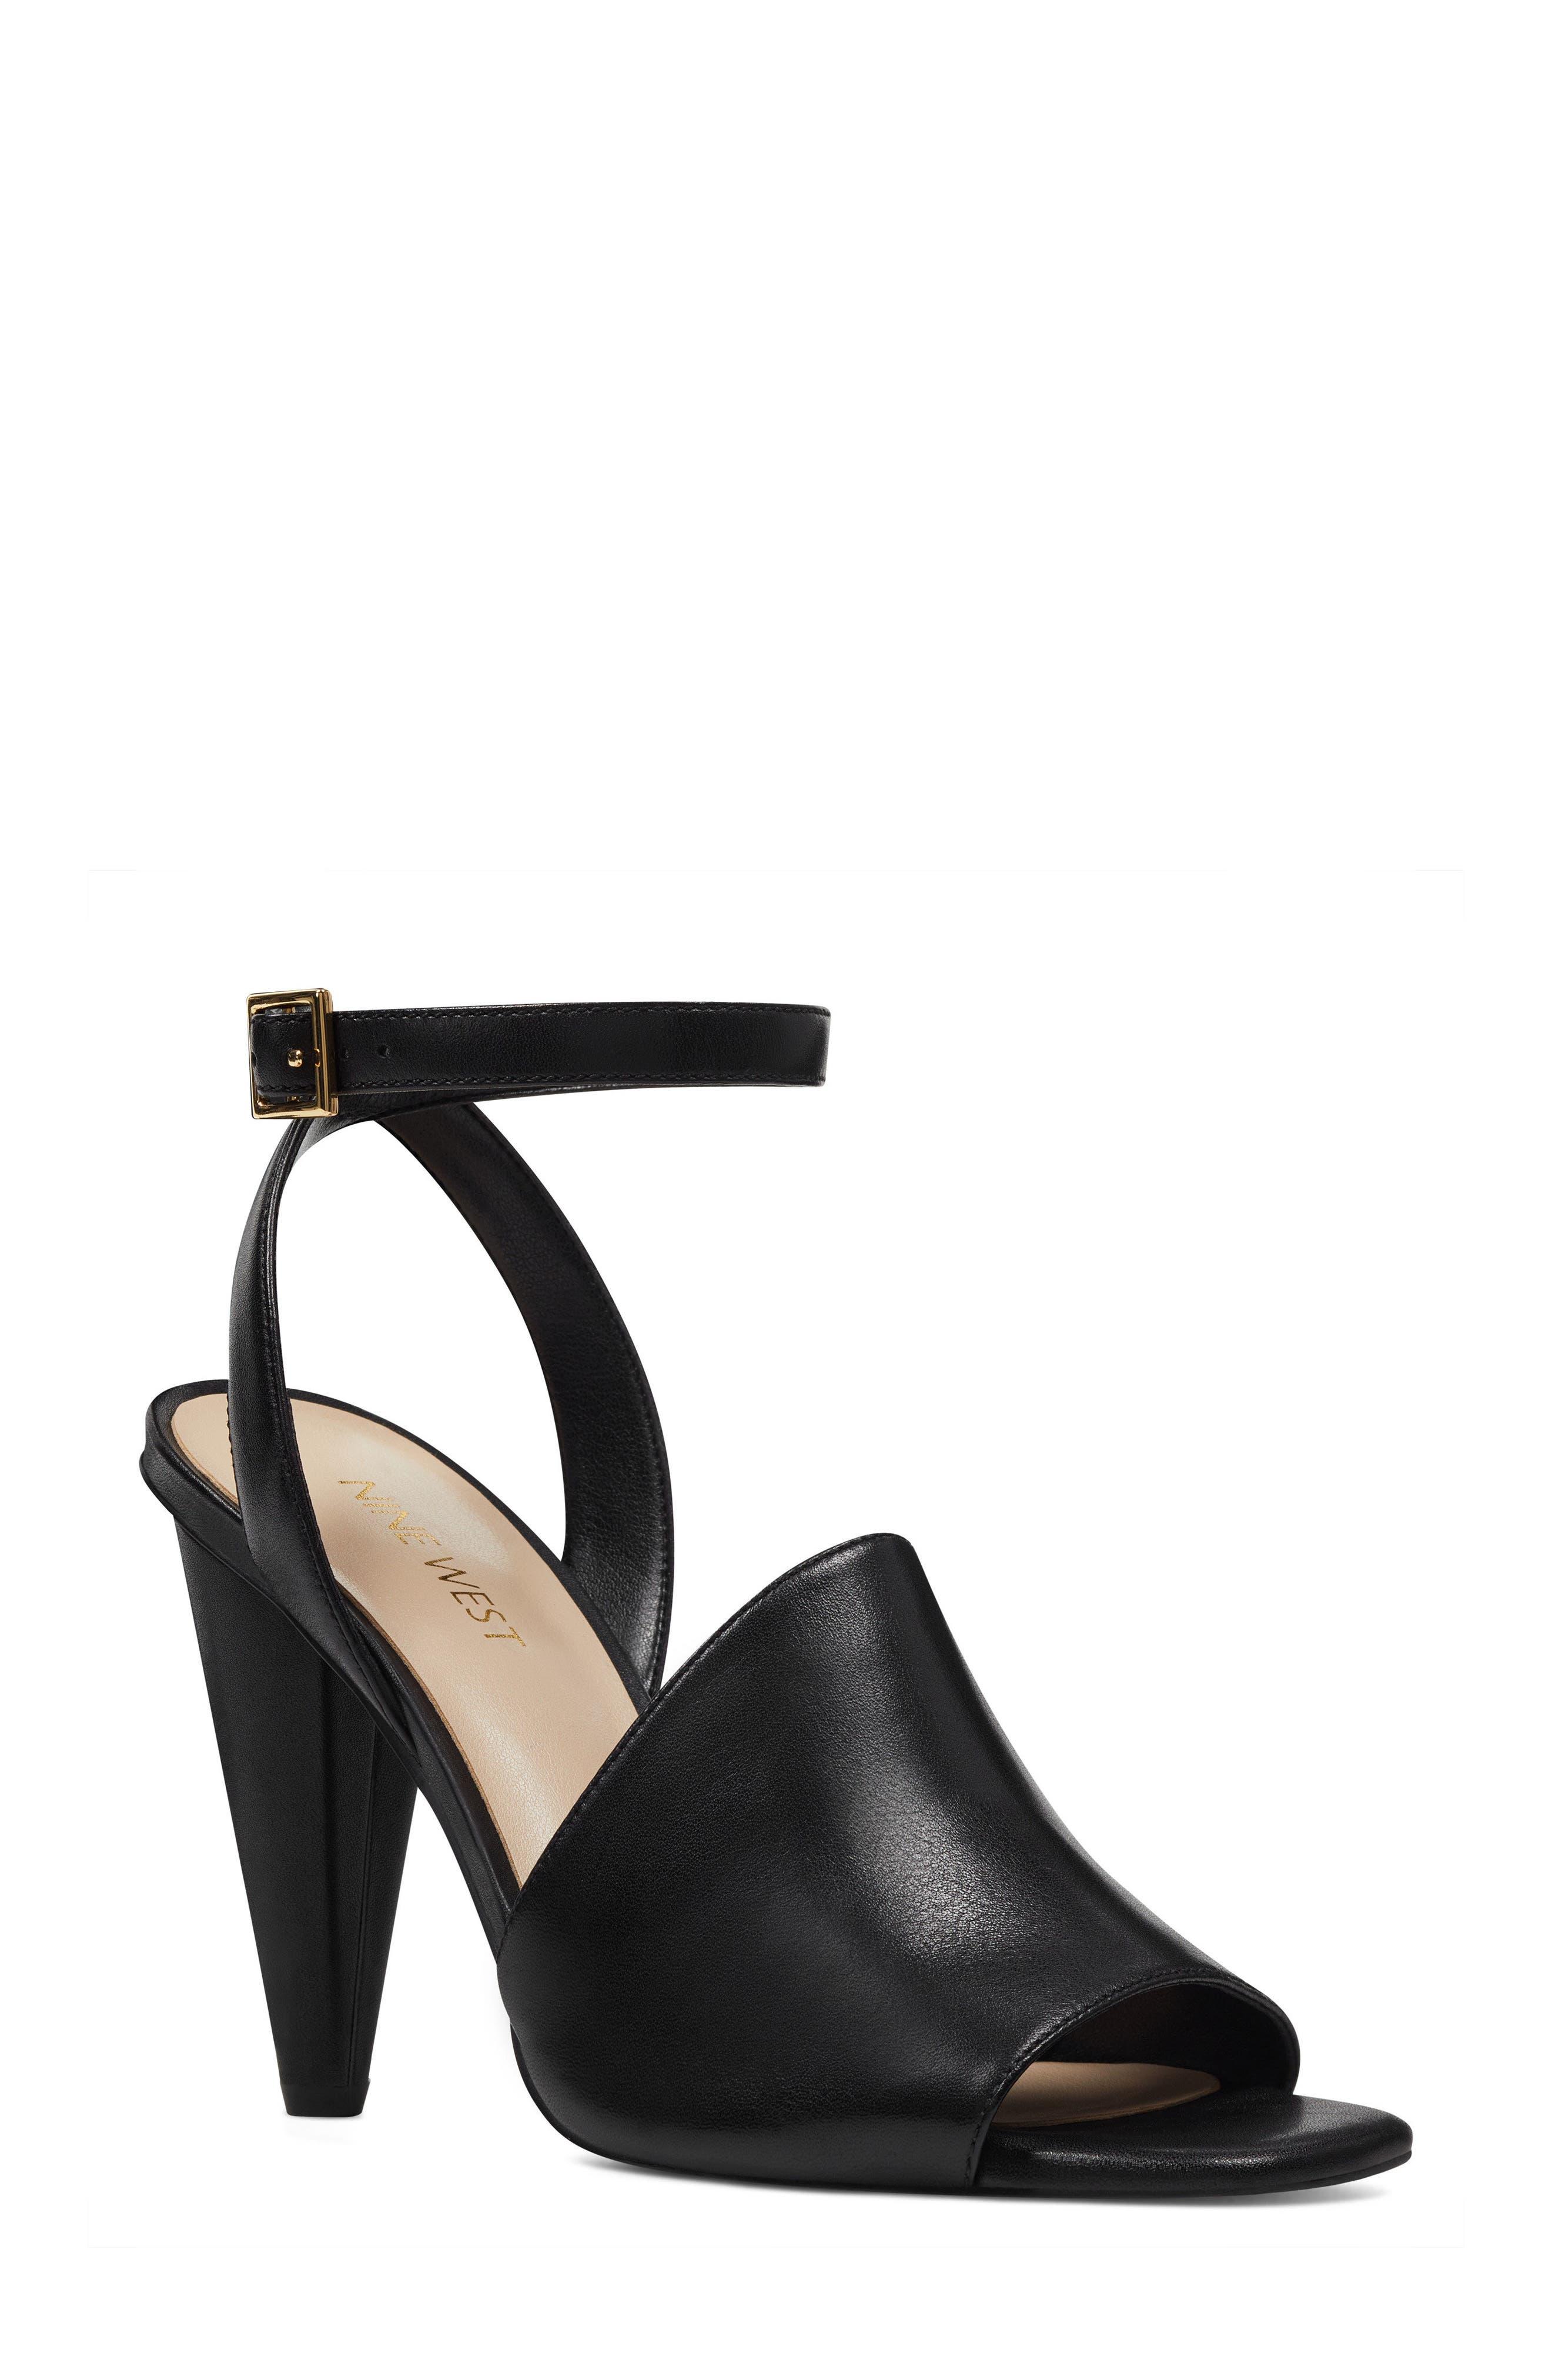 Quilty Ankle Strap Sandal,                         Main,                         color, 001